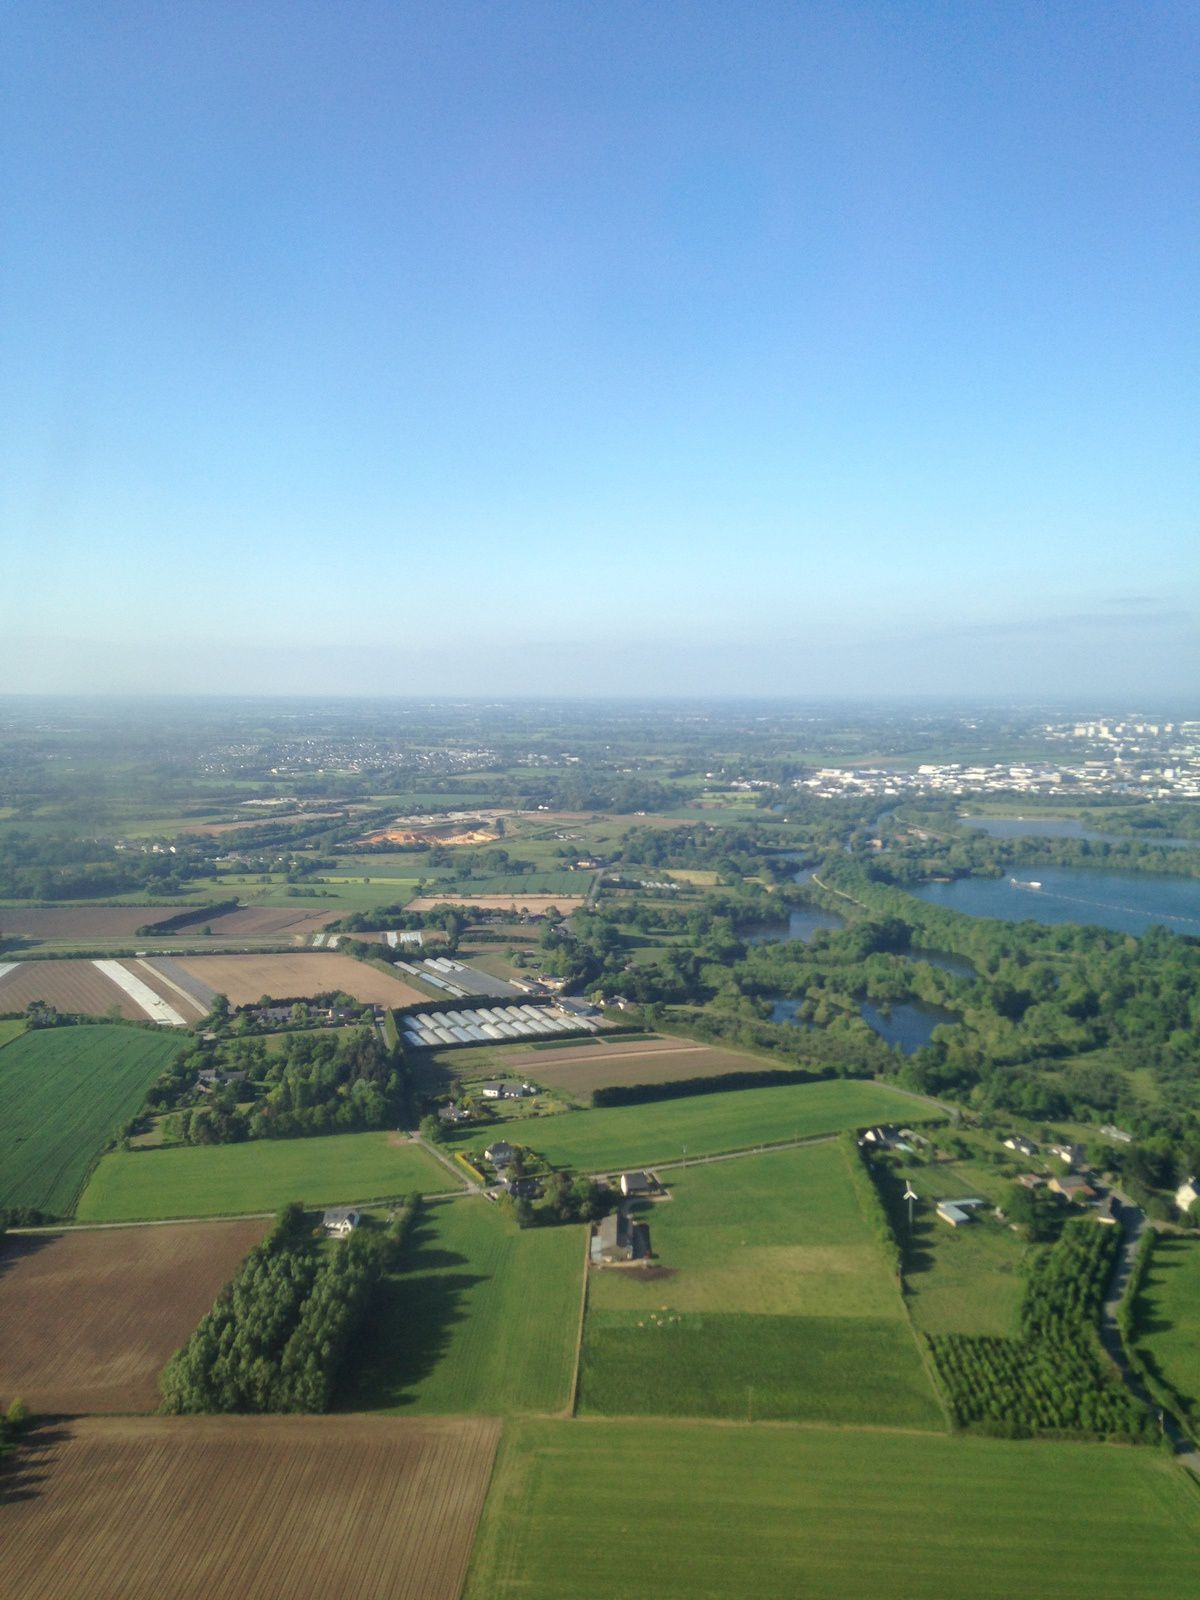 #ciel #rennes #avion #charlotteblabla blog